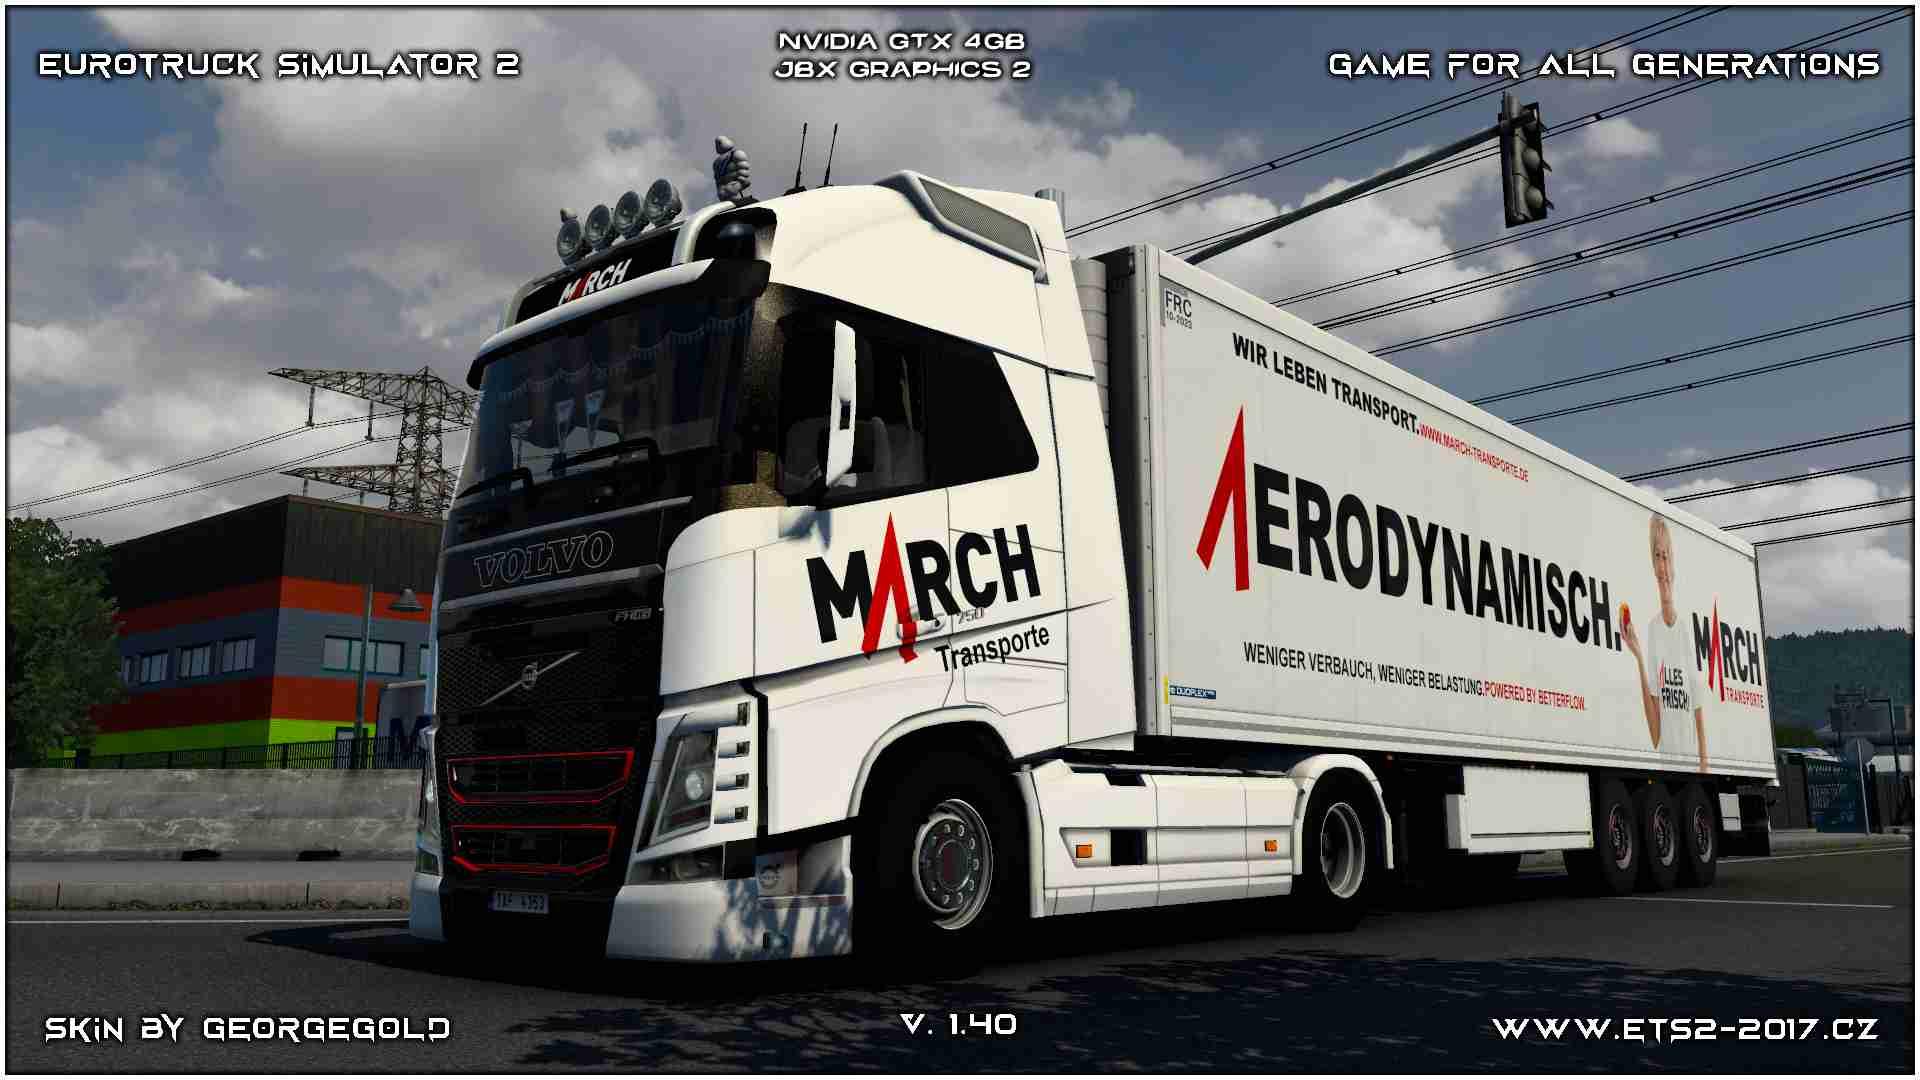 Combo Volvo FH 2012 March Transporte